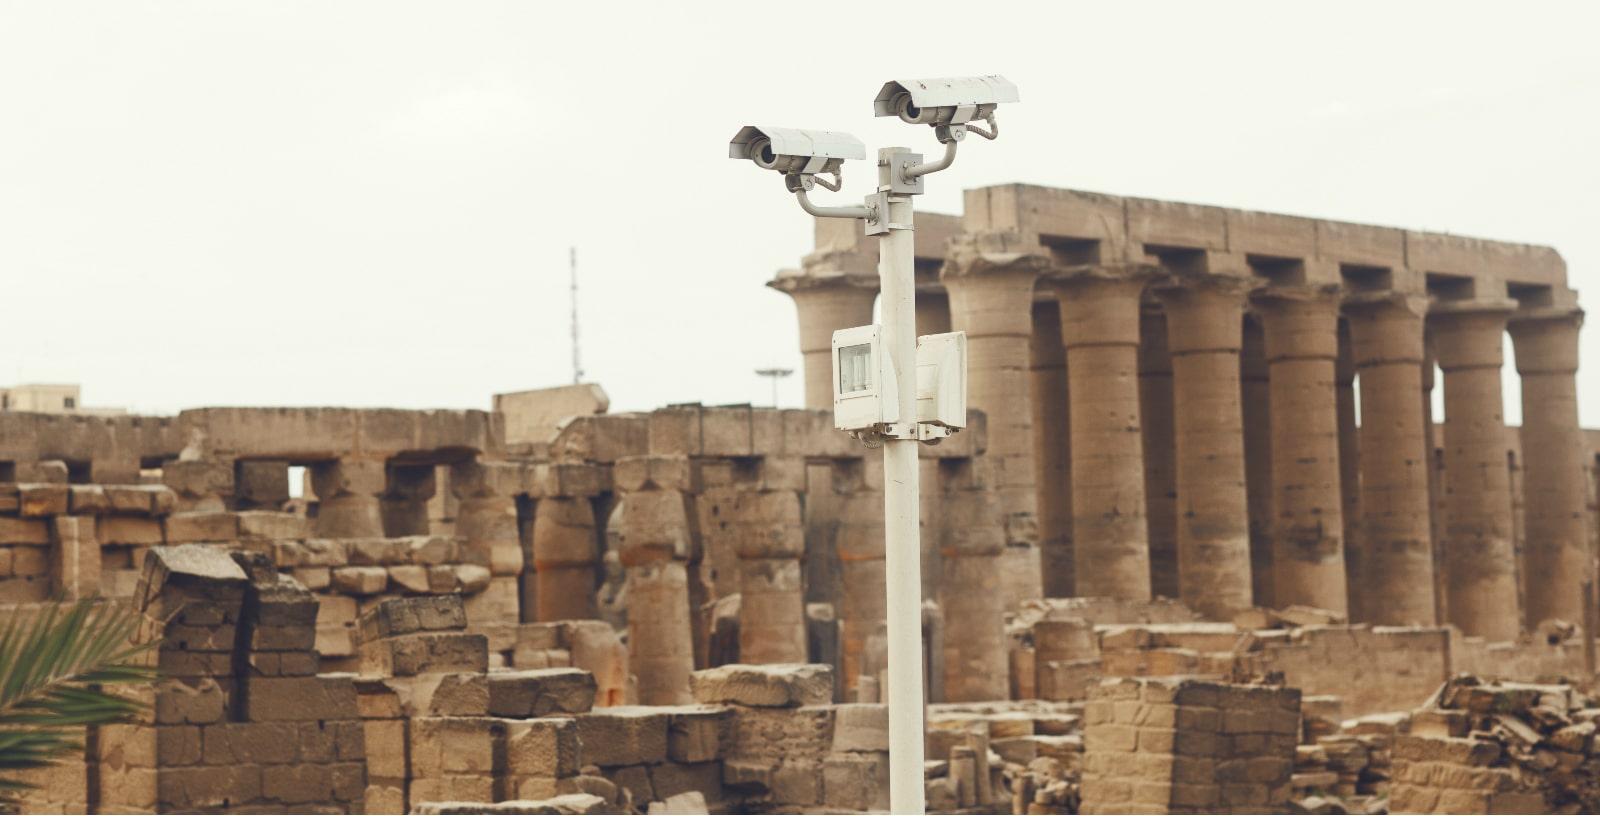 IDOM_Seguridad Egipto_1